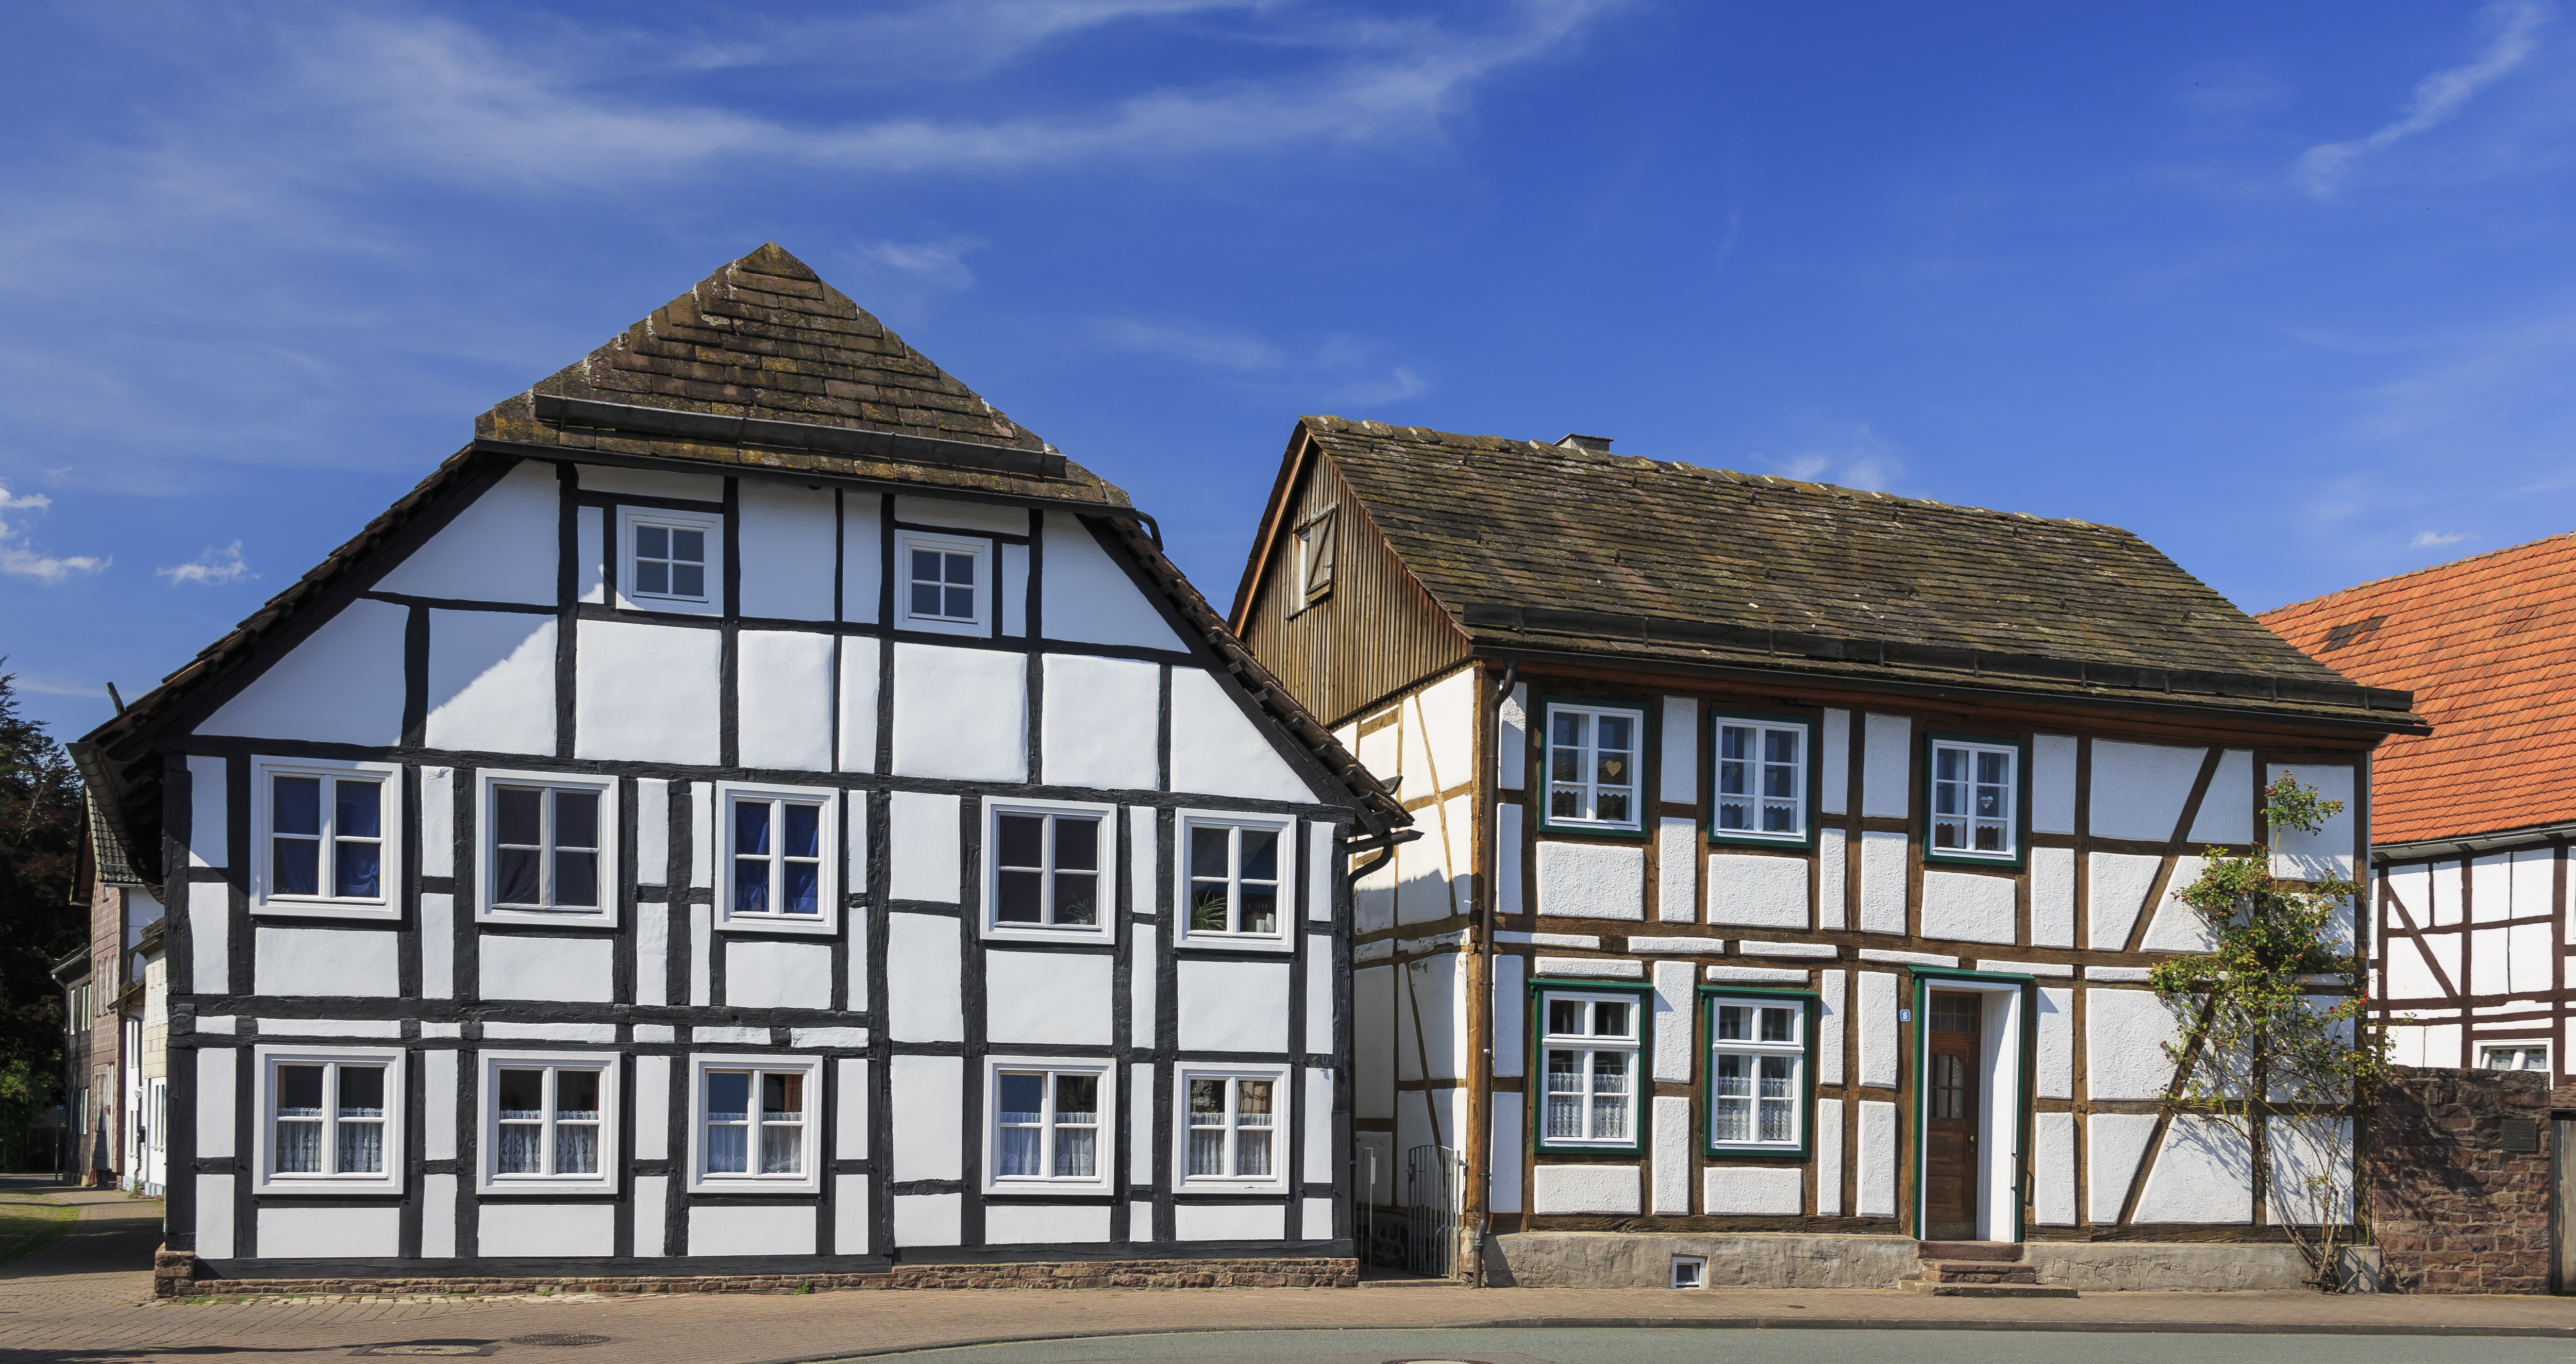 File:Höxter Germany Timber-framed-houses-01.jpg - Wikimedia Commons